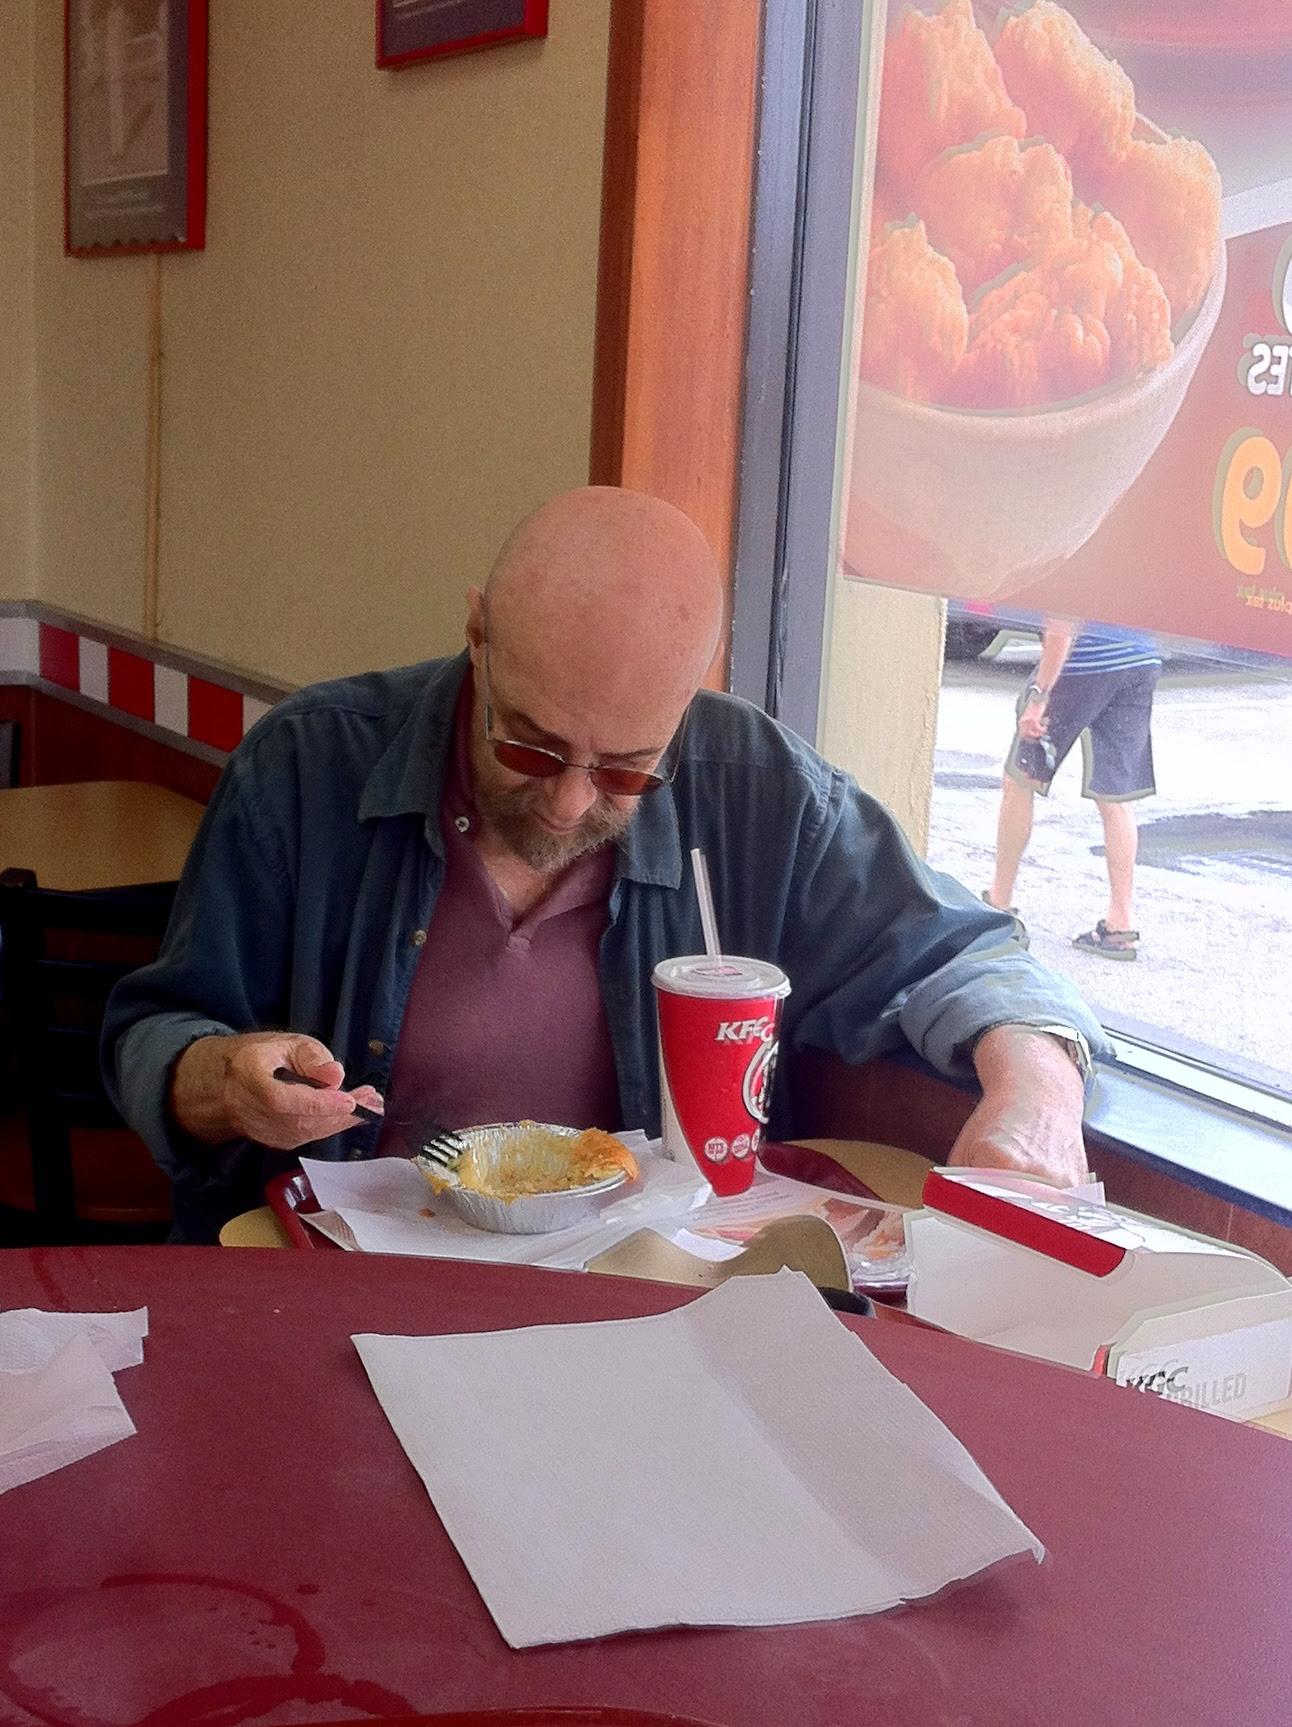 Lunch Alone